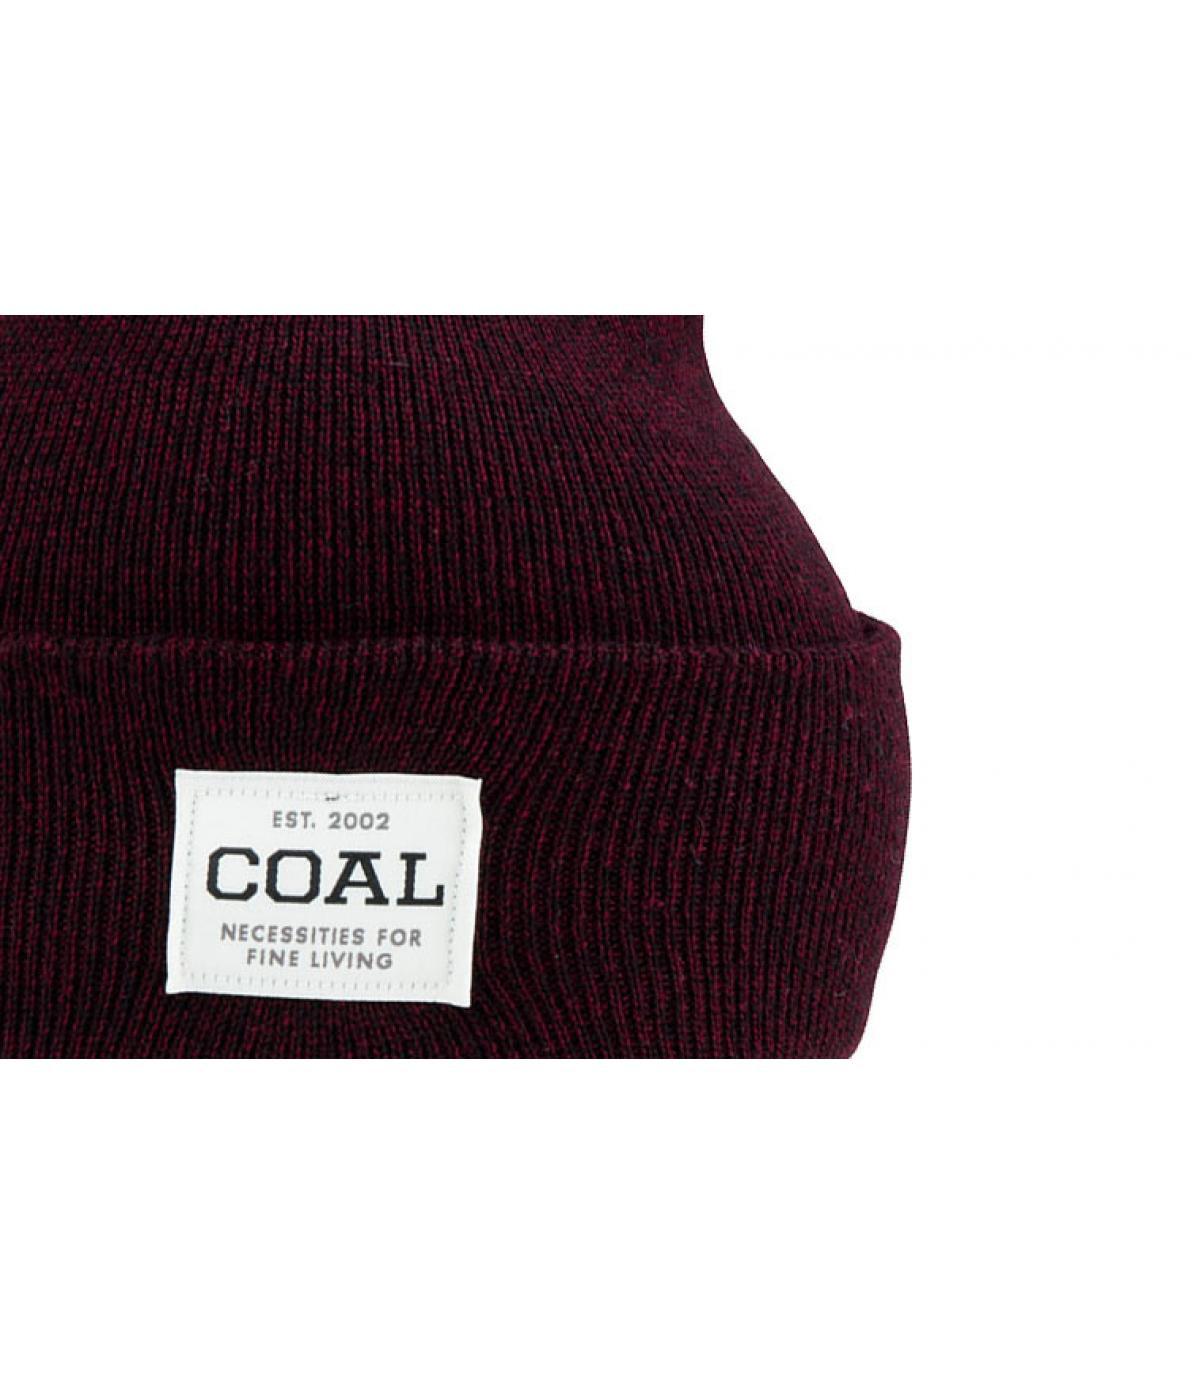 cappello bordeaux bavero del carbone